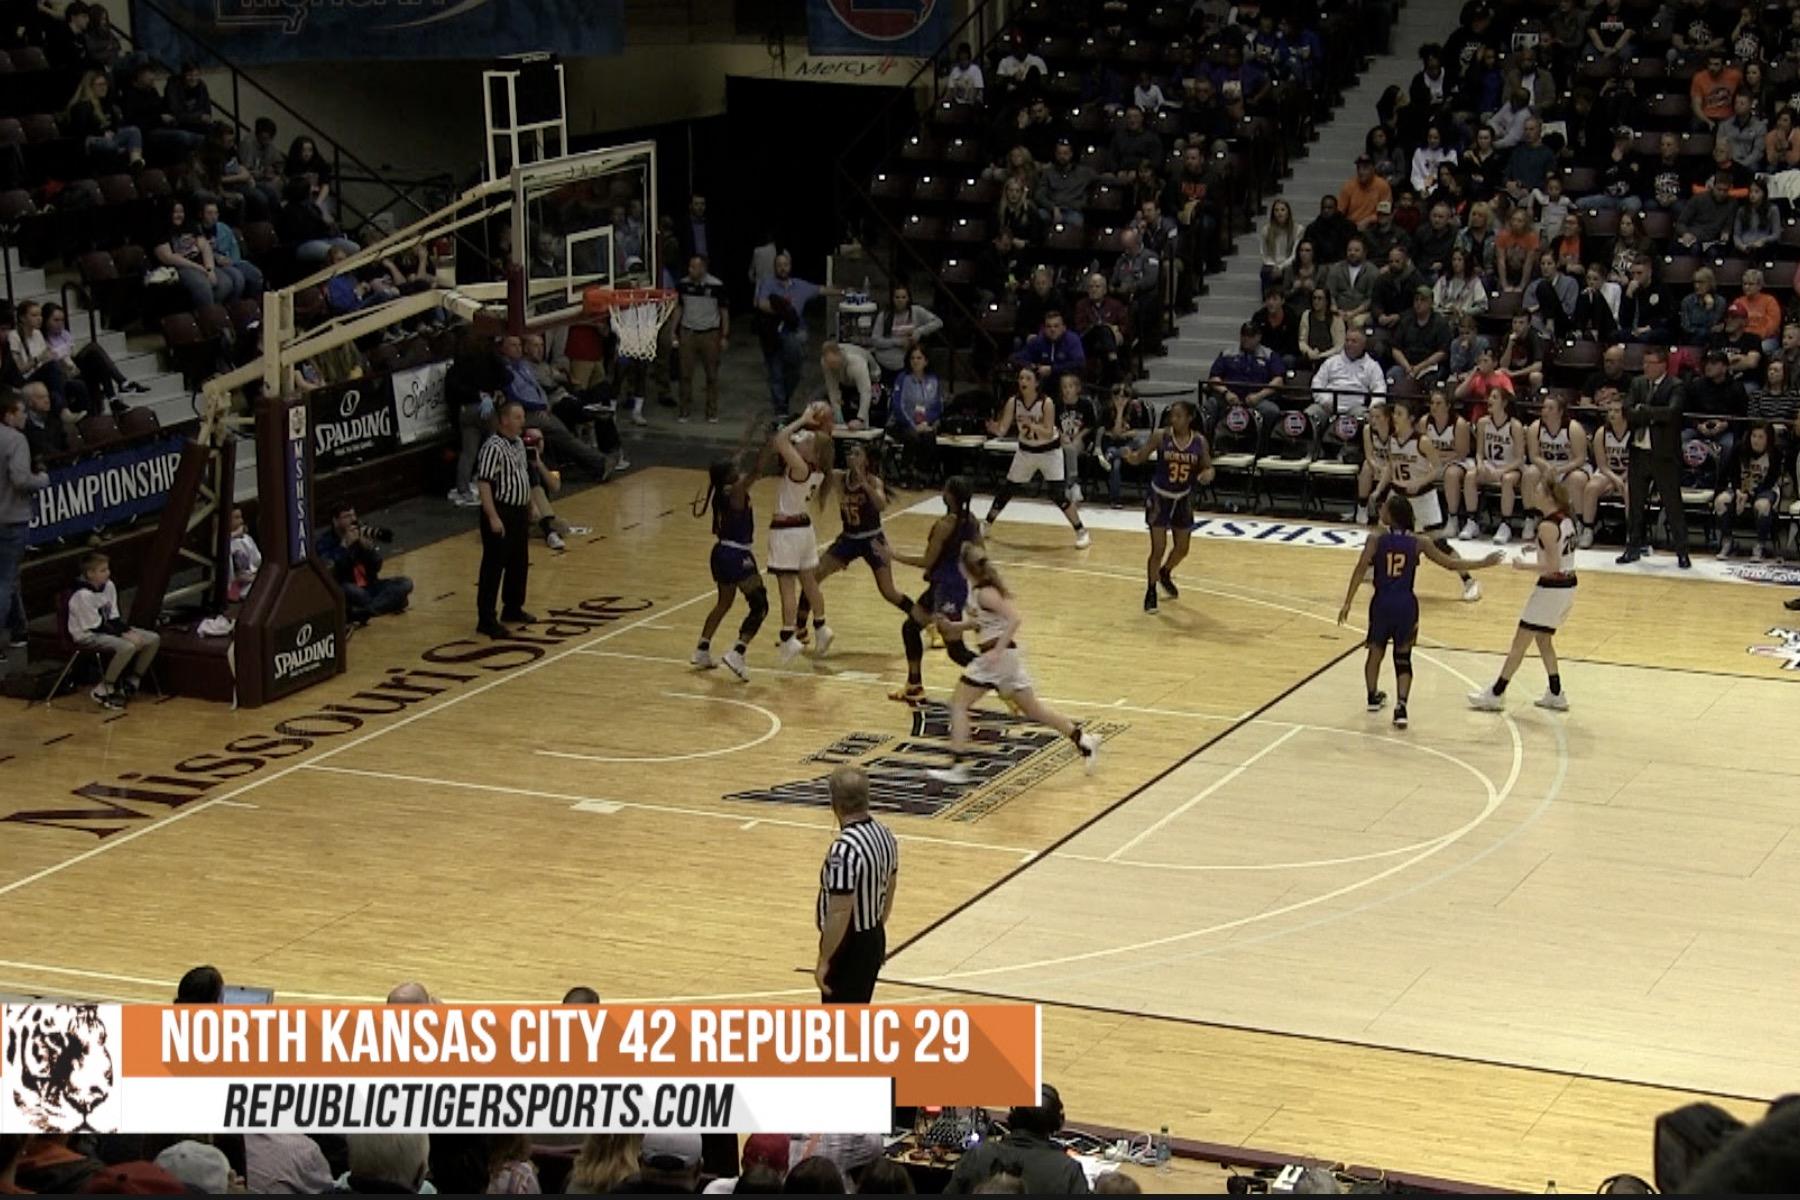 Video: Girls Basketball Highlights Vs North Kansas City